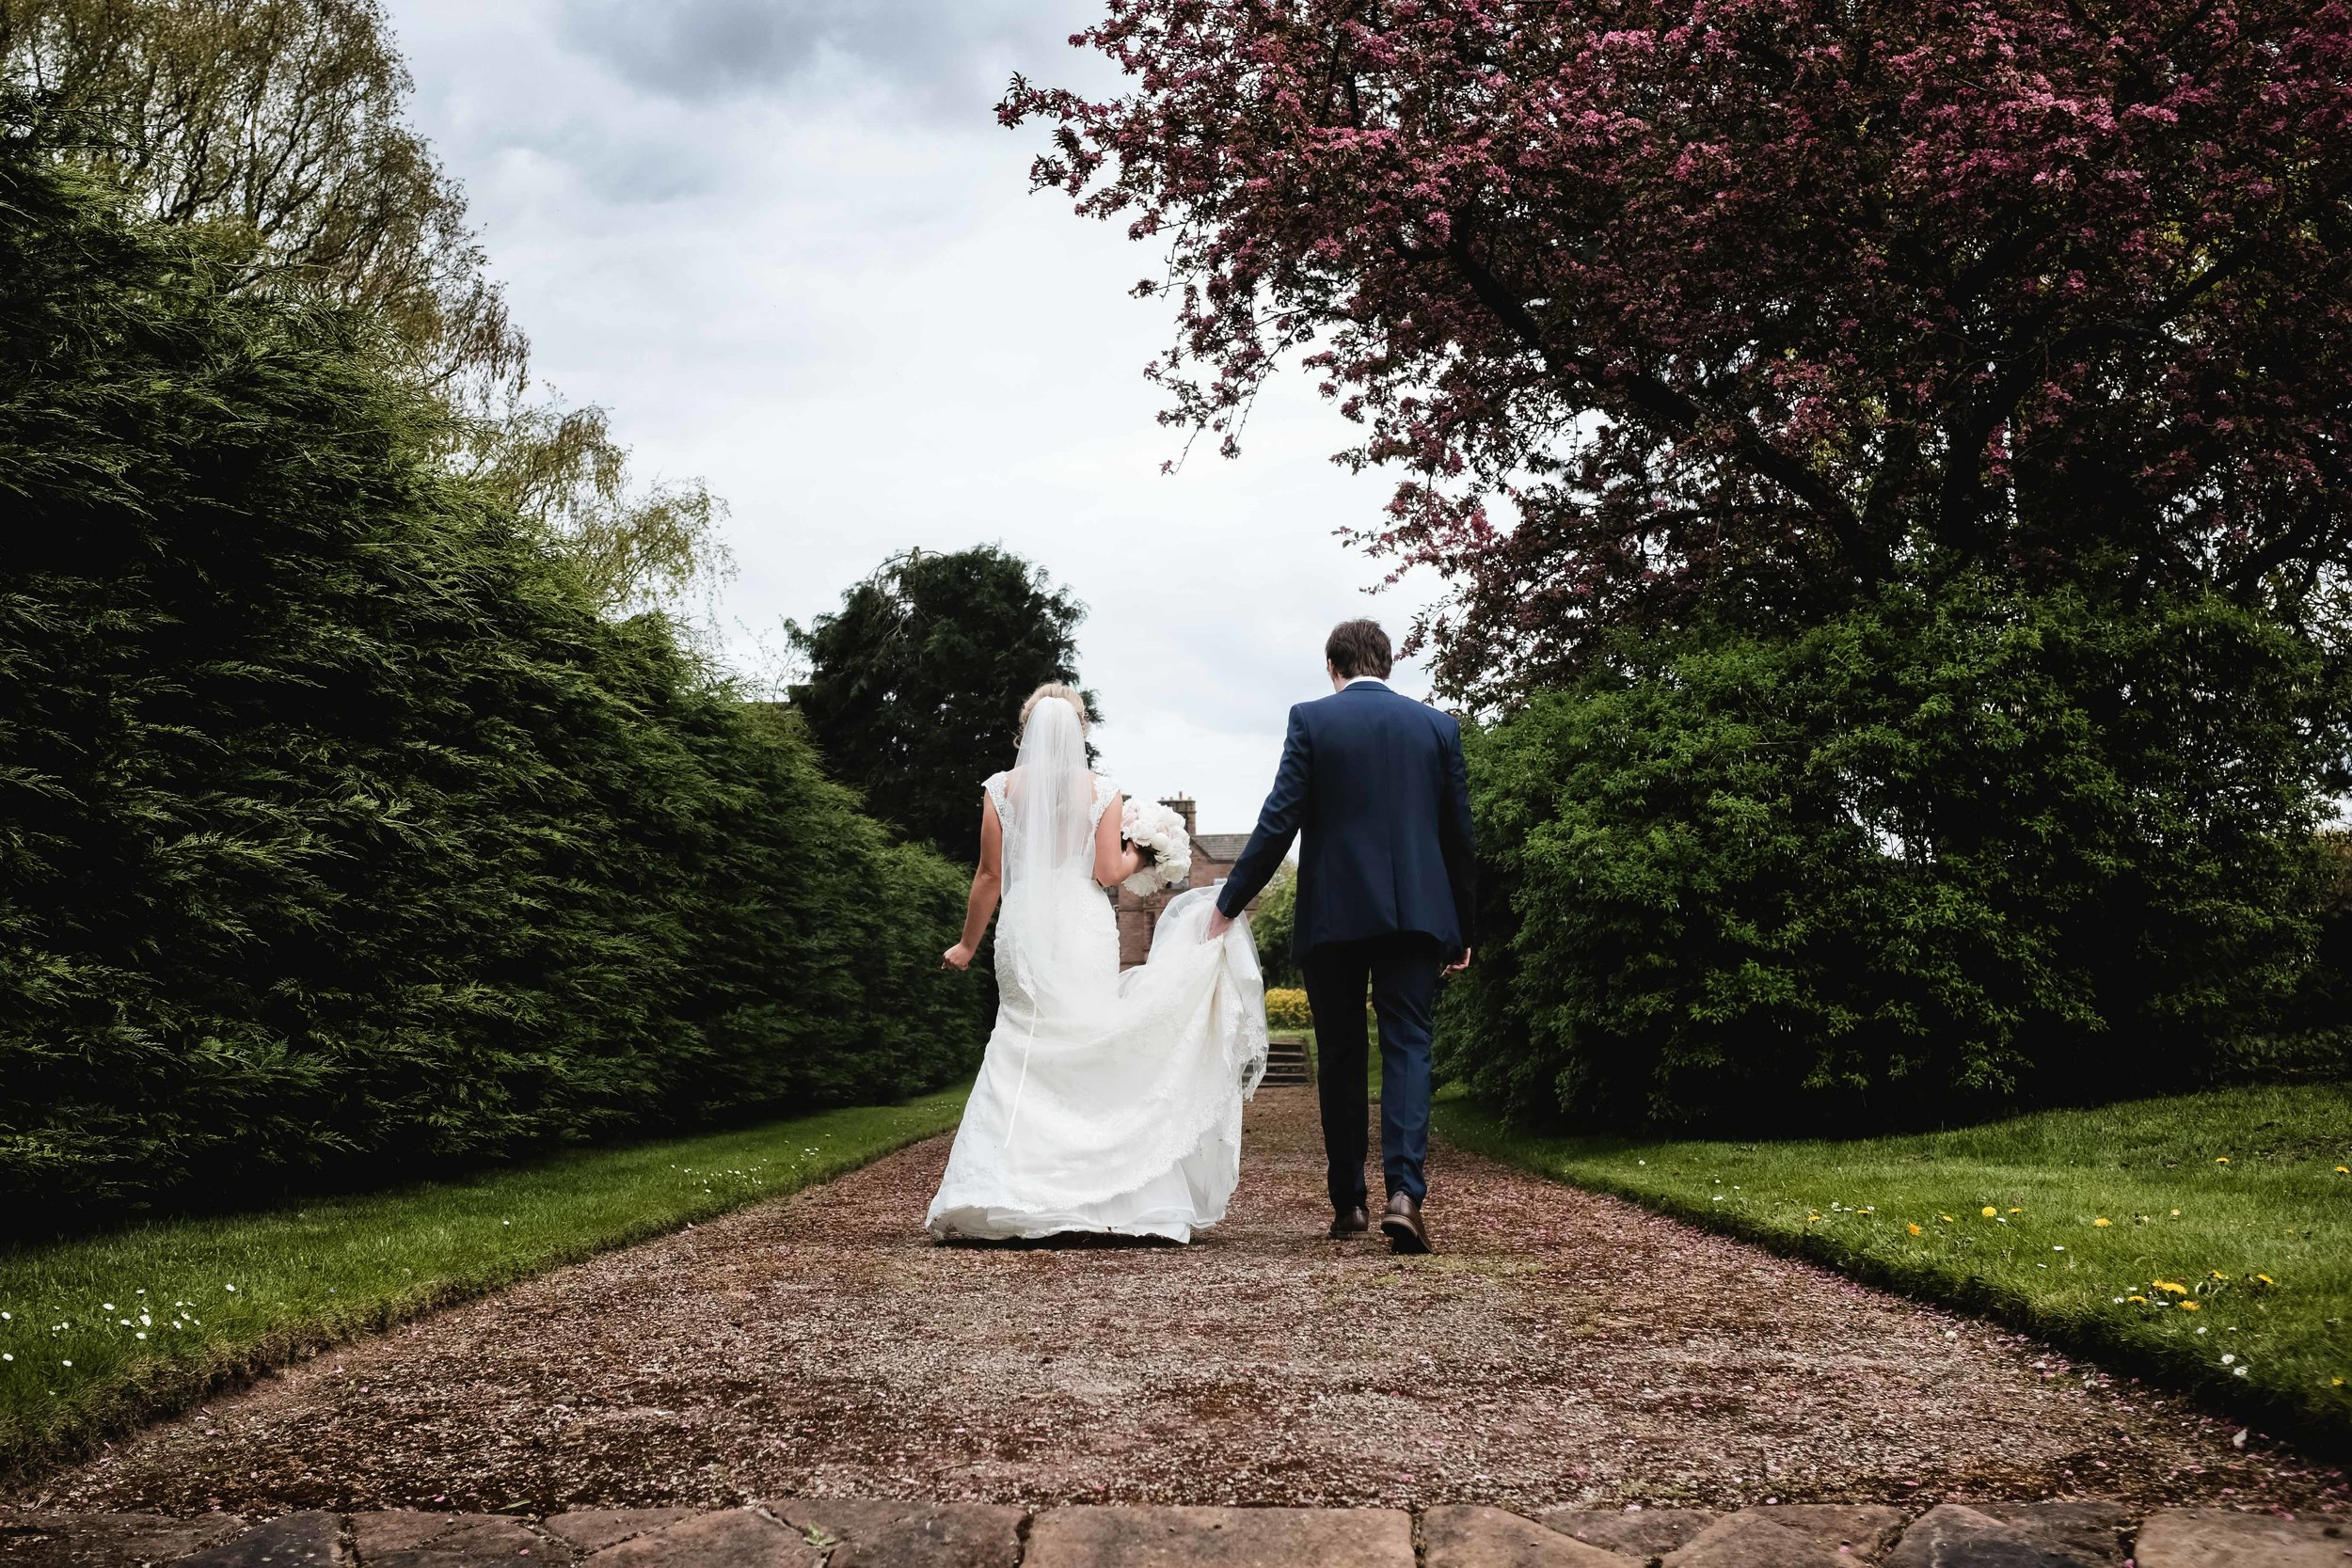 Thornton manor wedding photography cheshire wedding photographer liverpool manchester warrington chester wirral wedding BLOG (57 of 108).jpg